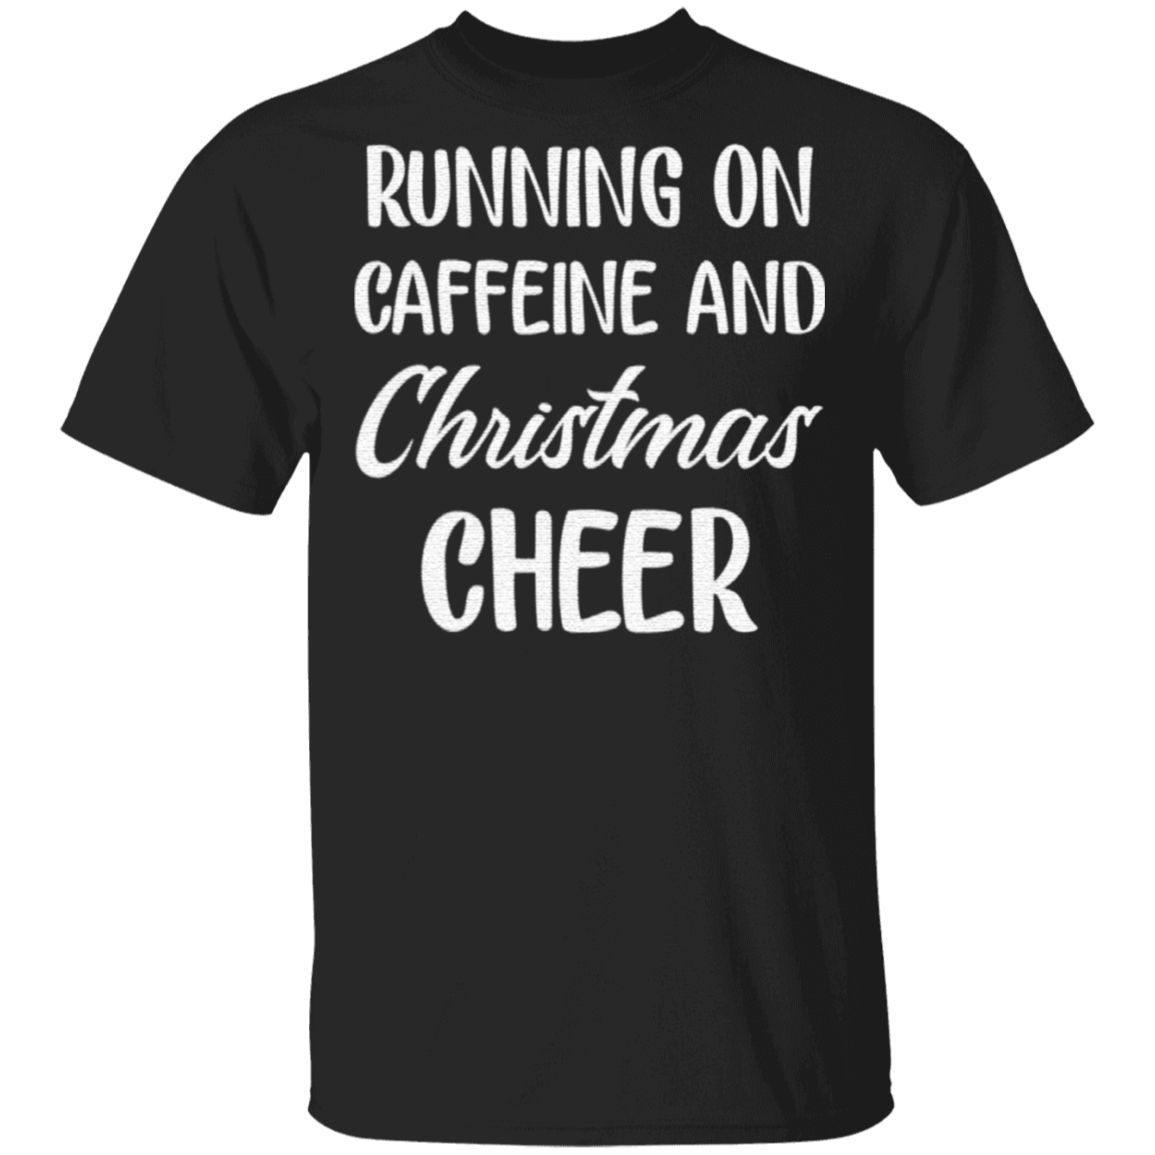 Running on caffeine and Christmas cheer t shirt